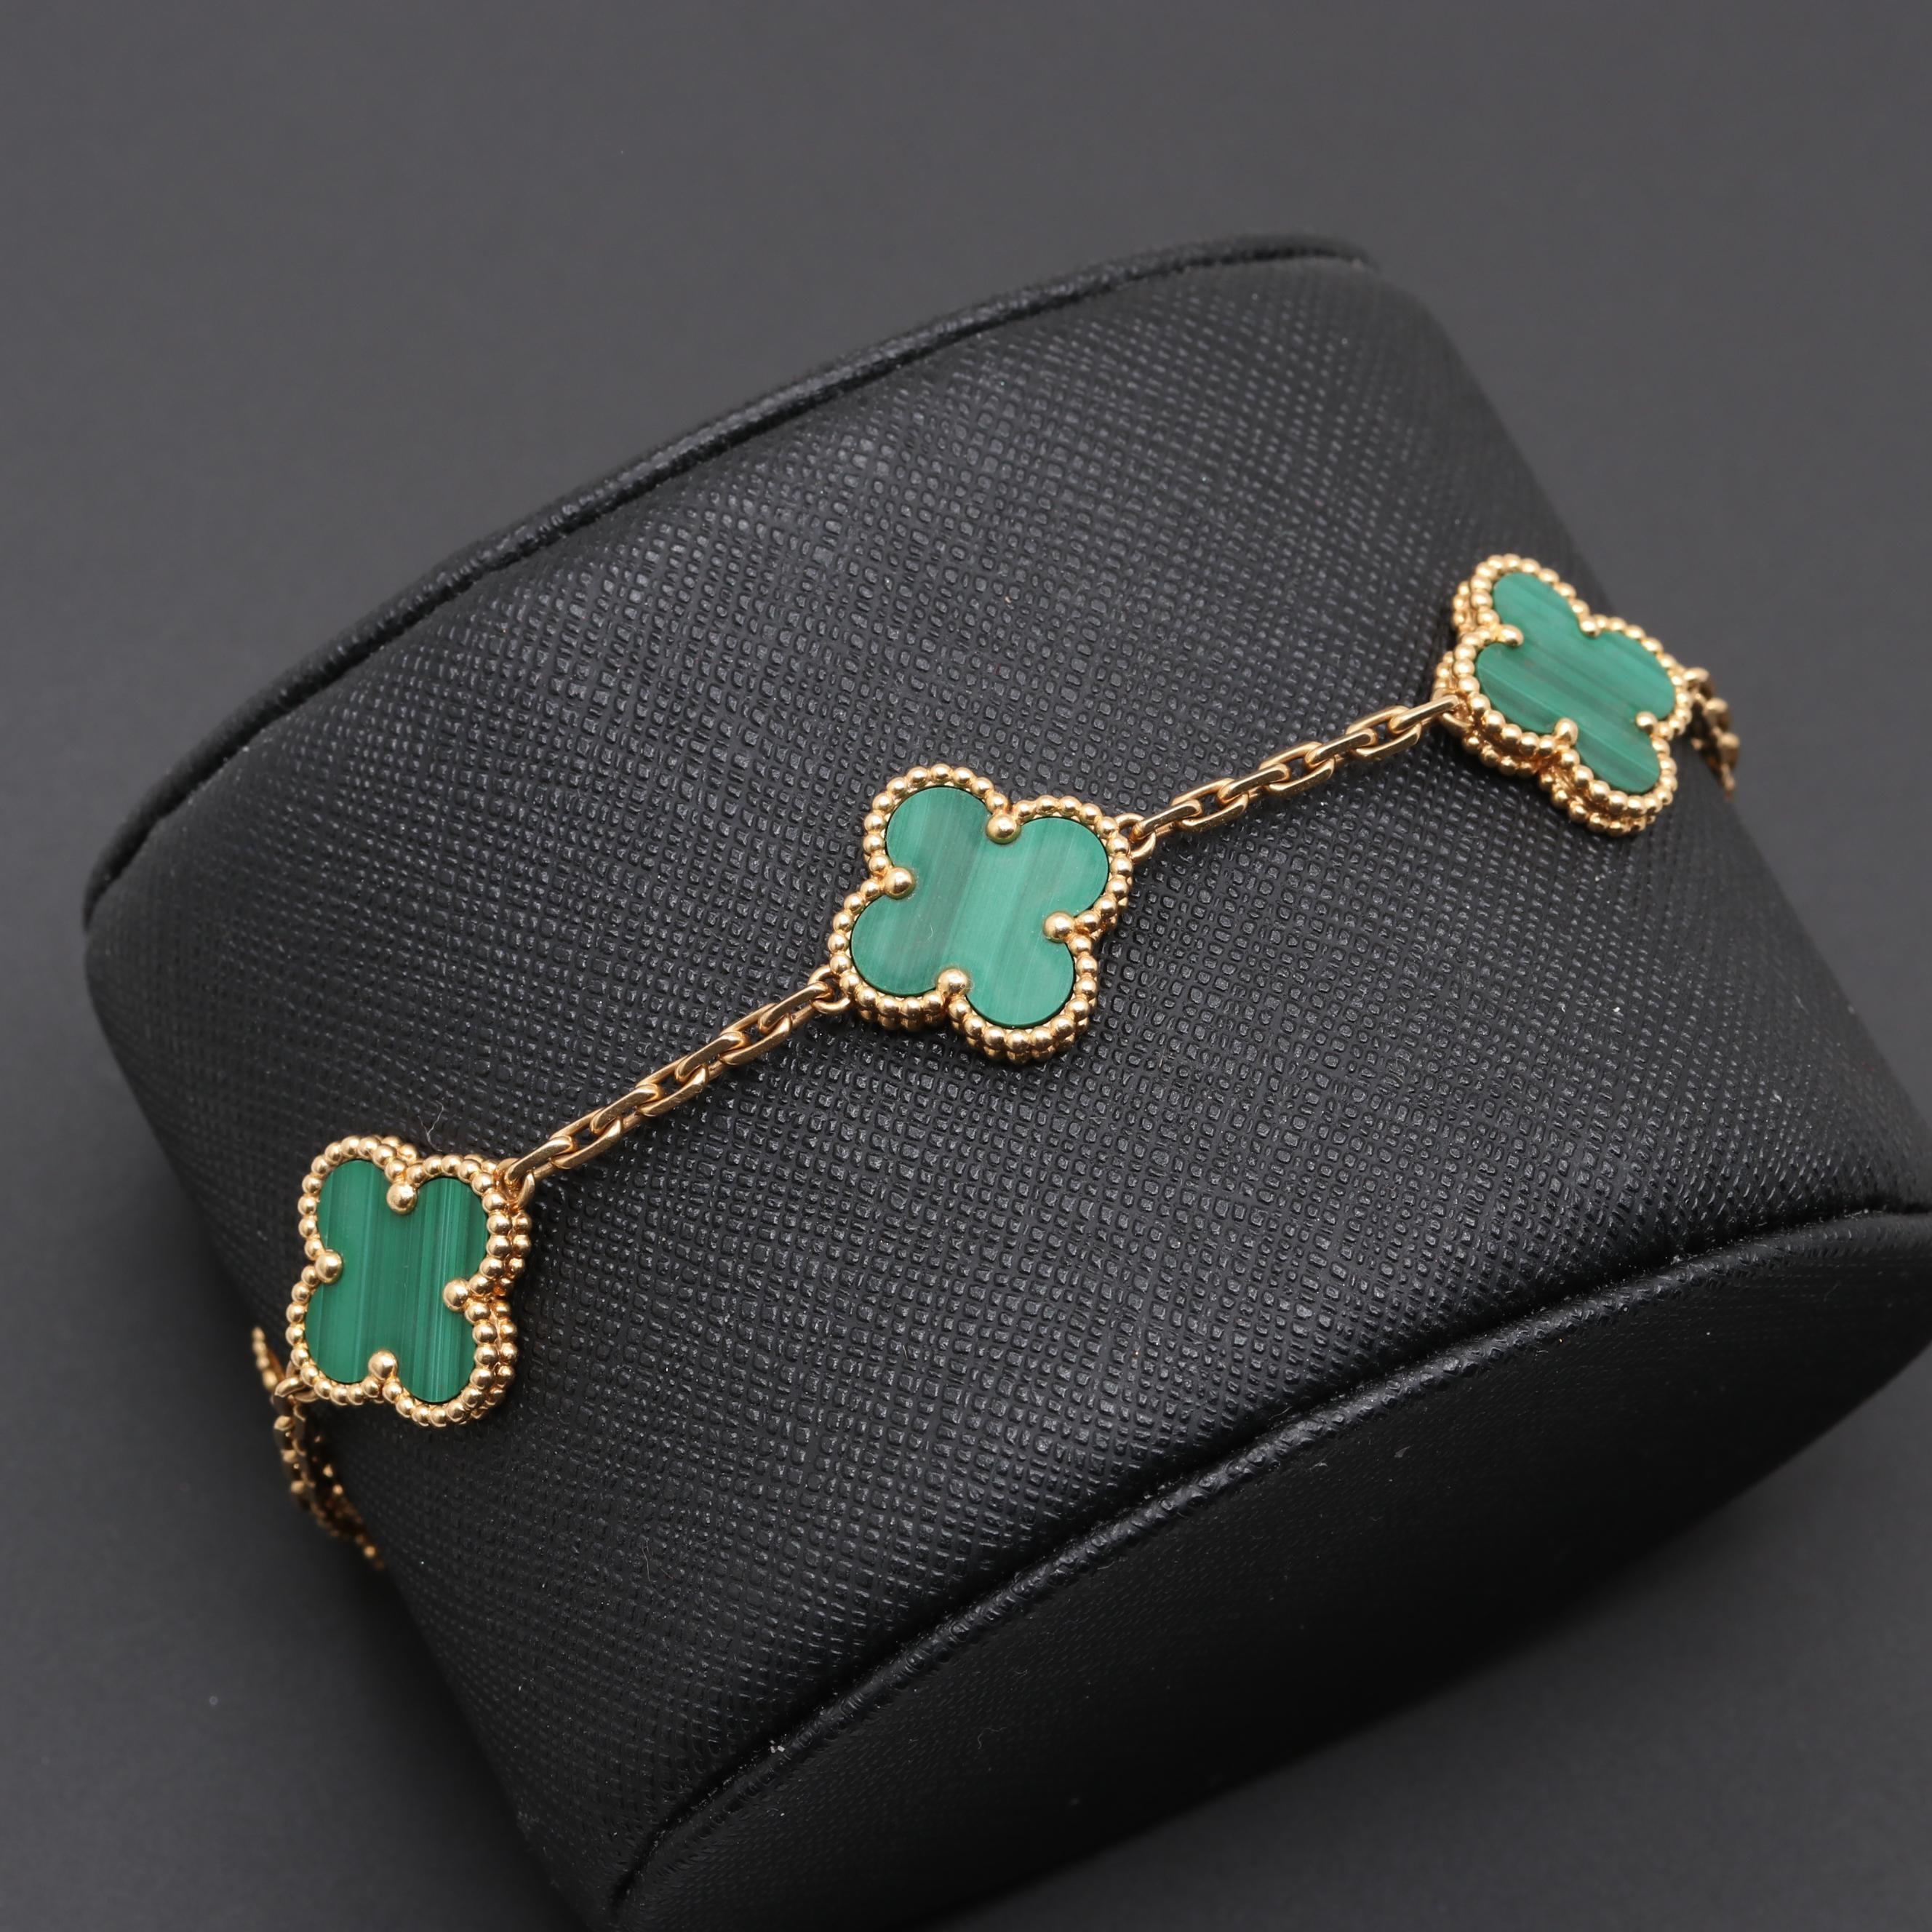 "Van Cleef & Arpels ""Alhambra"" 18K Yellow Gold Malachite Bracelet"